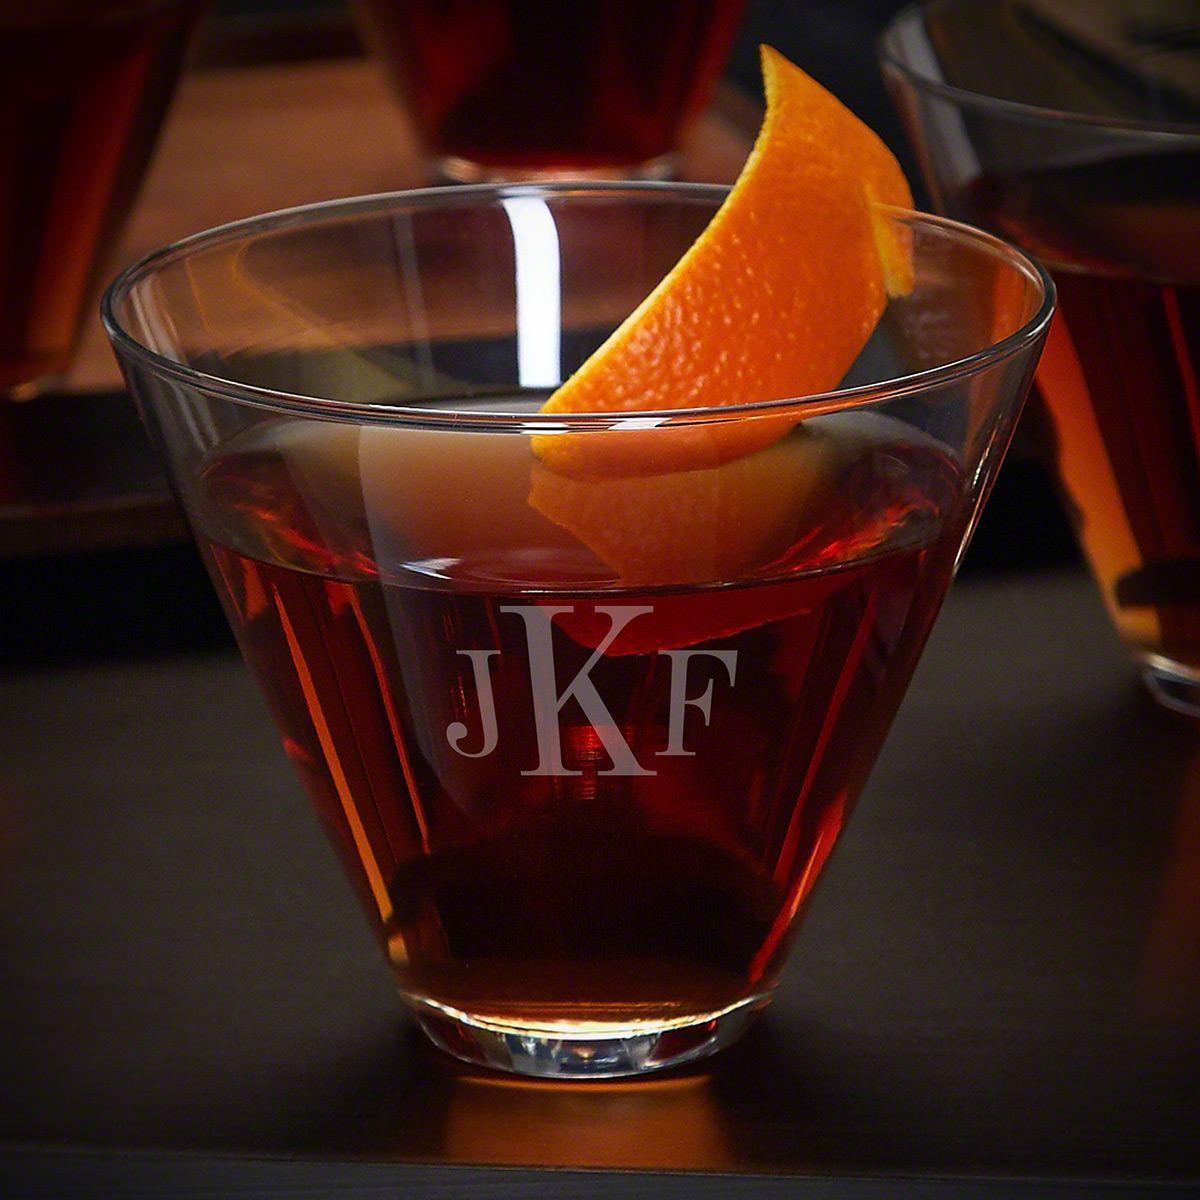 Classic Monogram Engraved Stemless Unique Martini Glass Cocktail Glass Manhattan Glass Martini